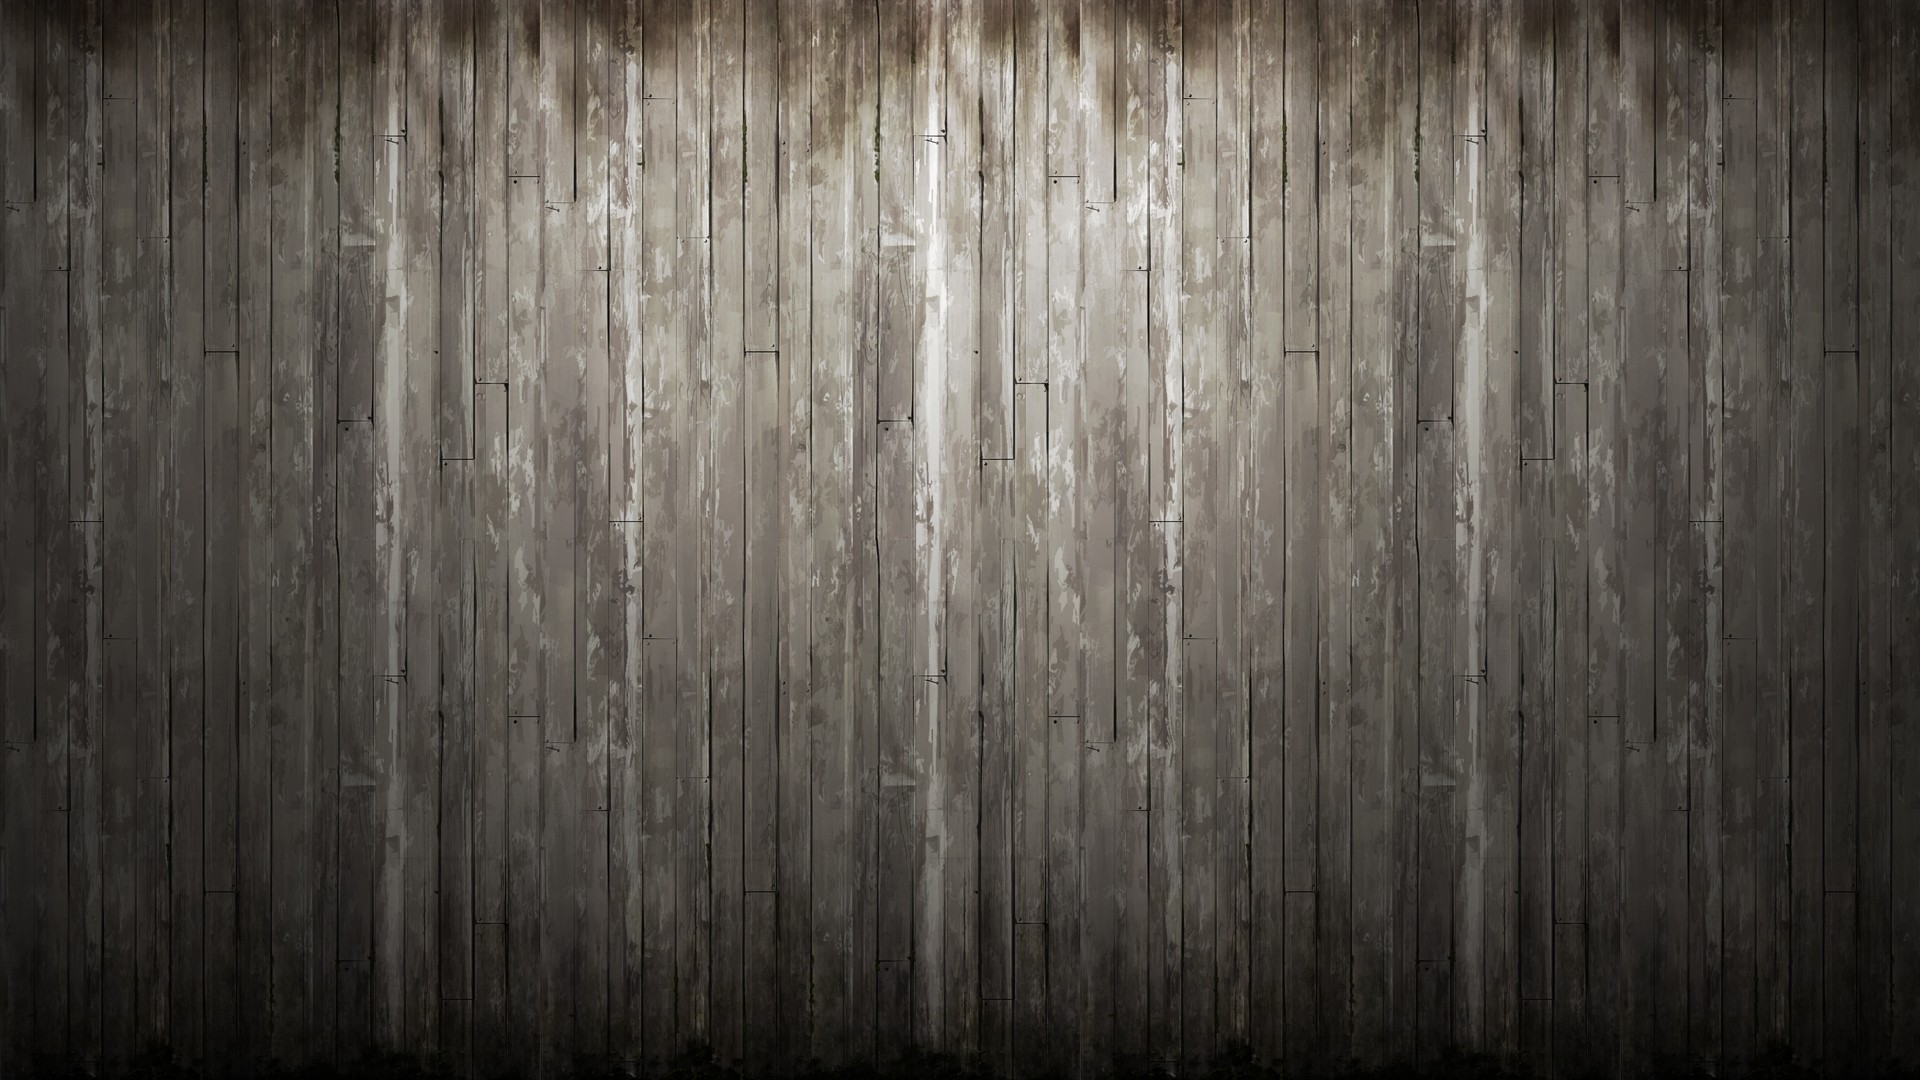 Shiplap Full HD Wallpaper